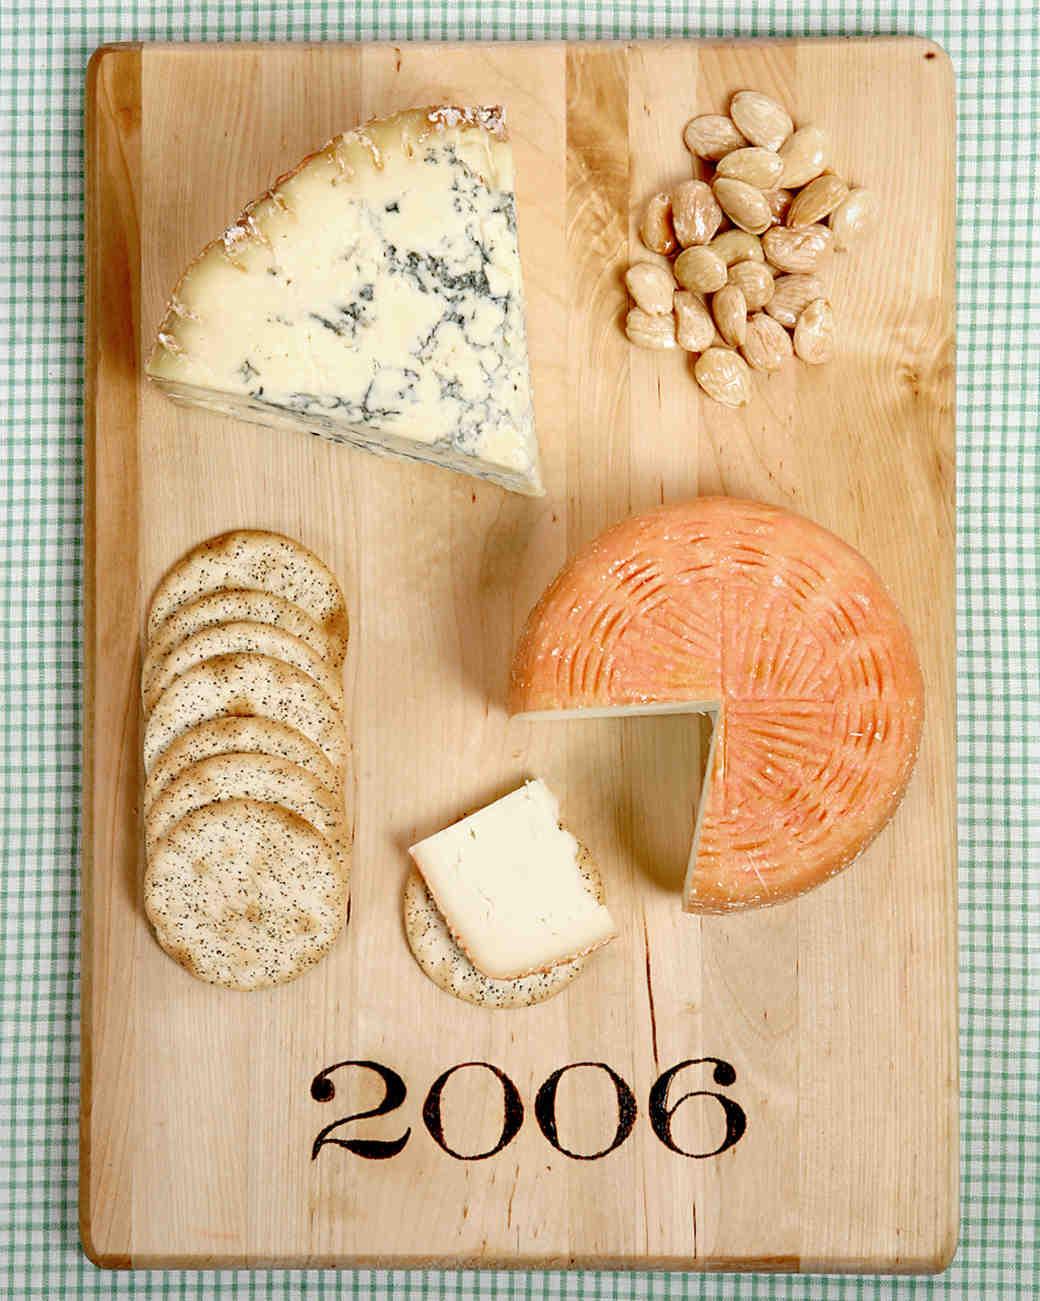 diy-bridesmaid-gifts-cheese-board-ms-show-dec-06-0515.jpg